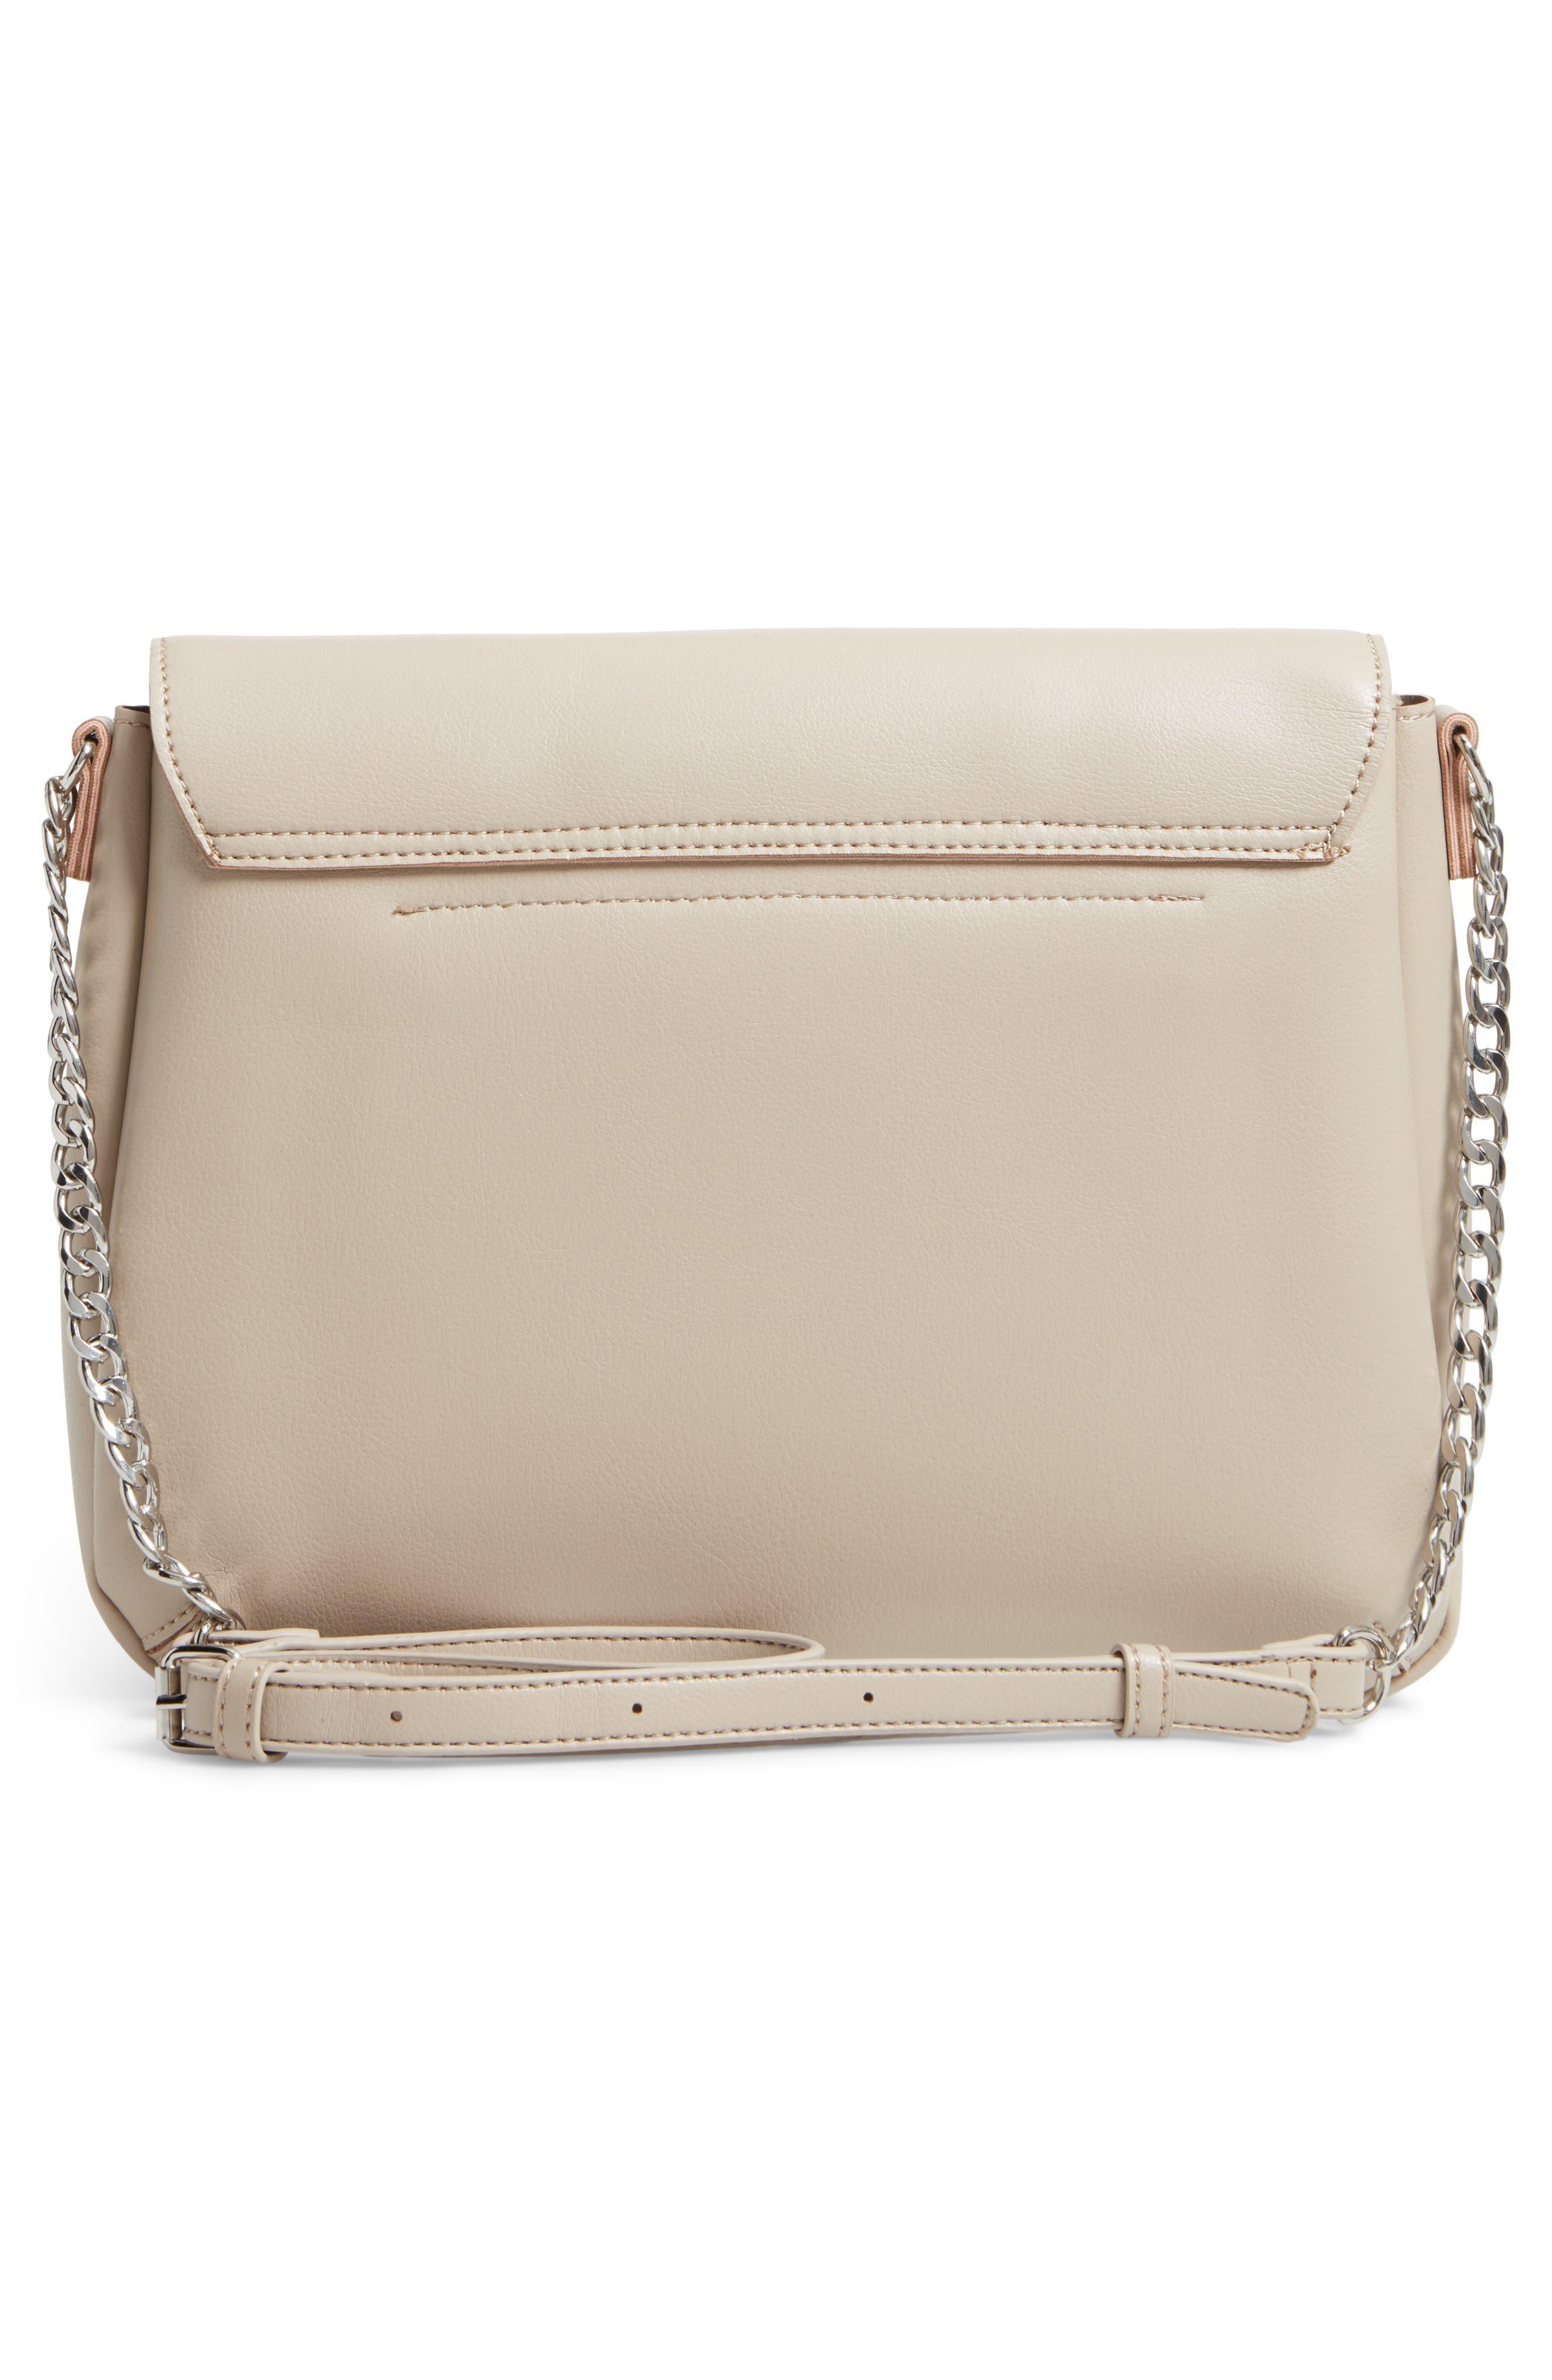 BP., Faux Leather Flap Crossbody Bag, Alternate thumbnail 3, color, 020